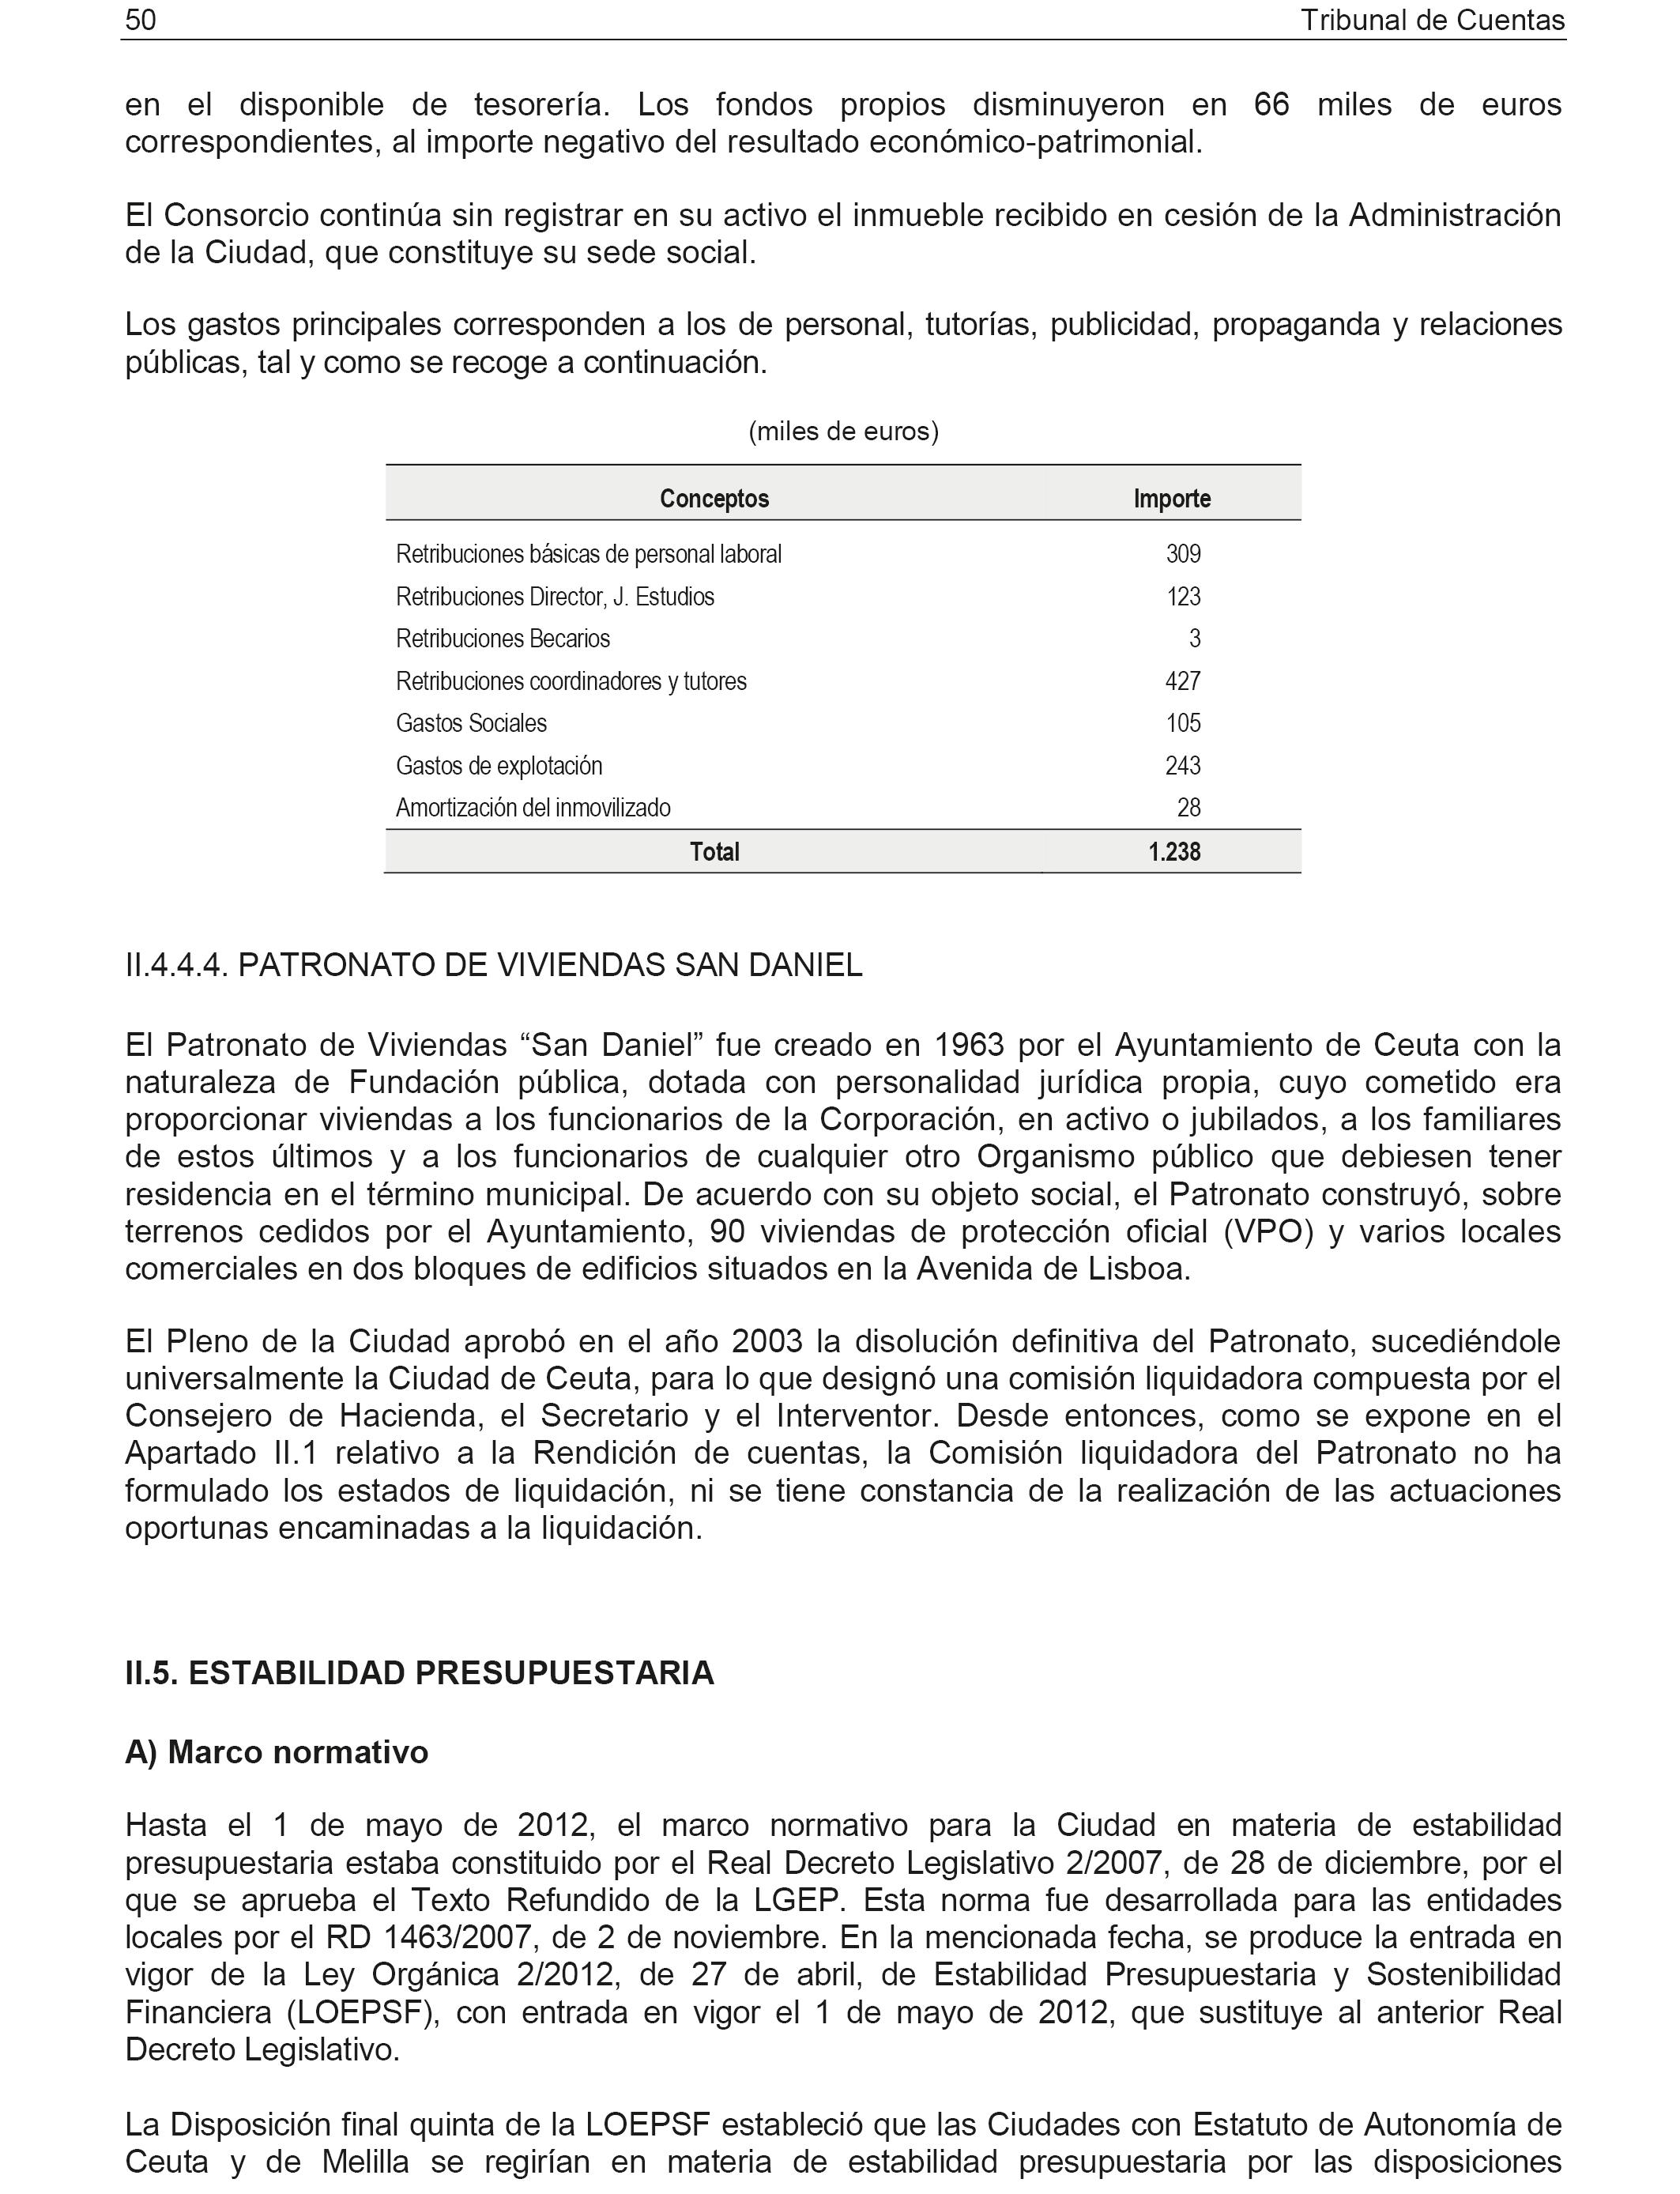 BOE.es - Documento BOE-A-2017-9102